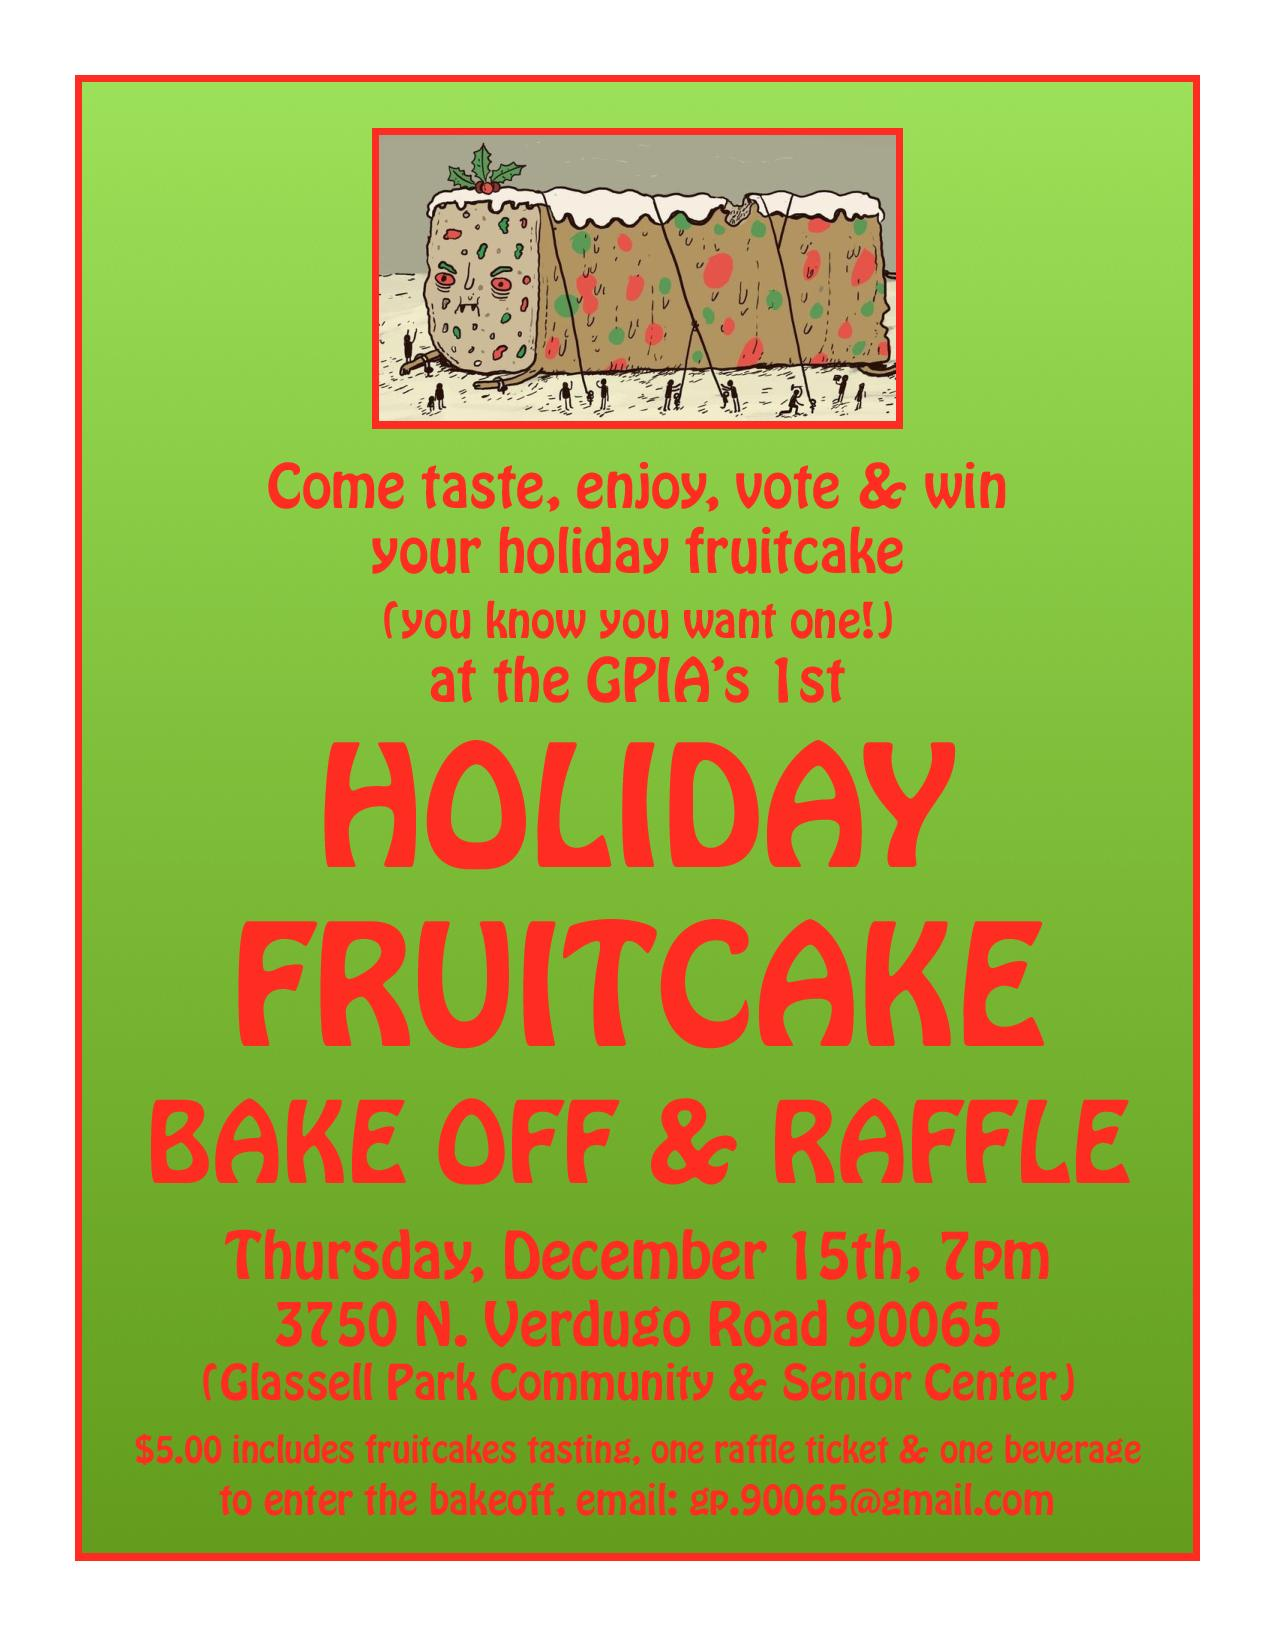 Fruitcake_flyer-page-001.jpg